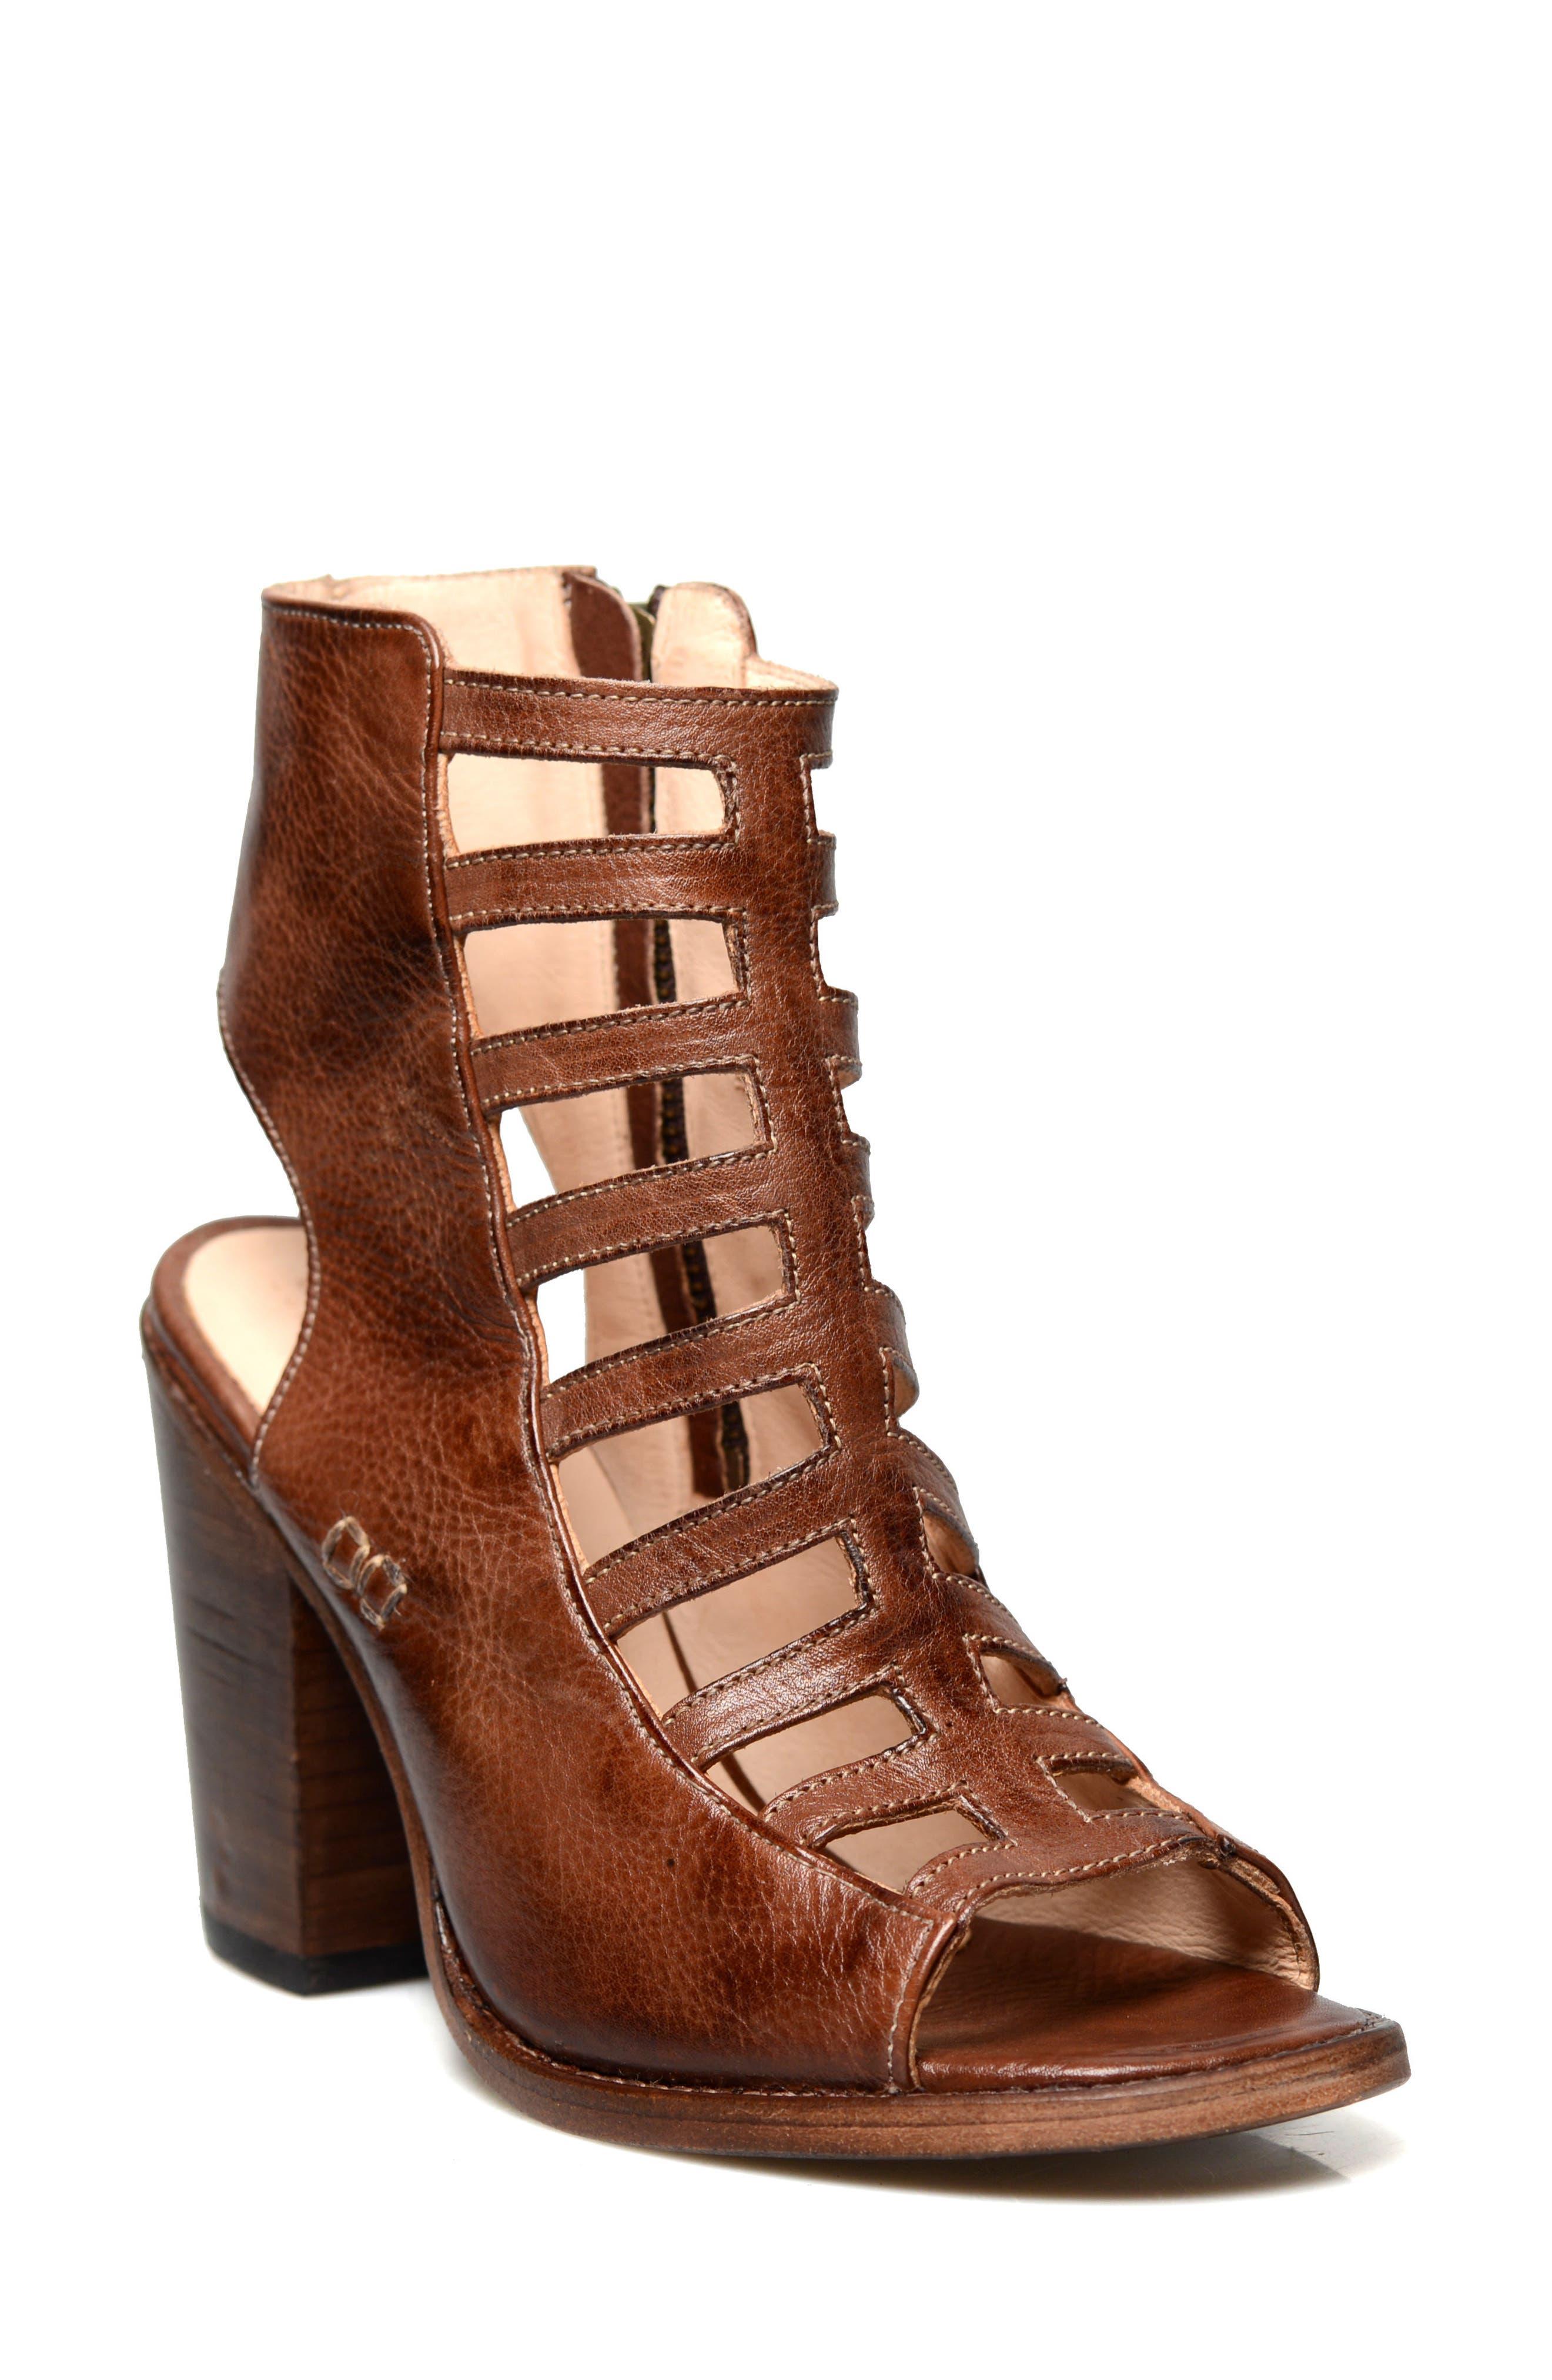 Occam Caged Sandal,                         Main,                         color, Teak Rustic Leather